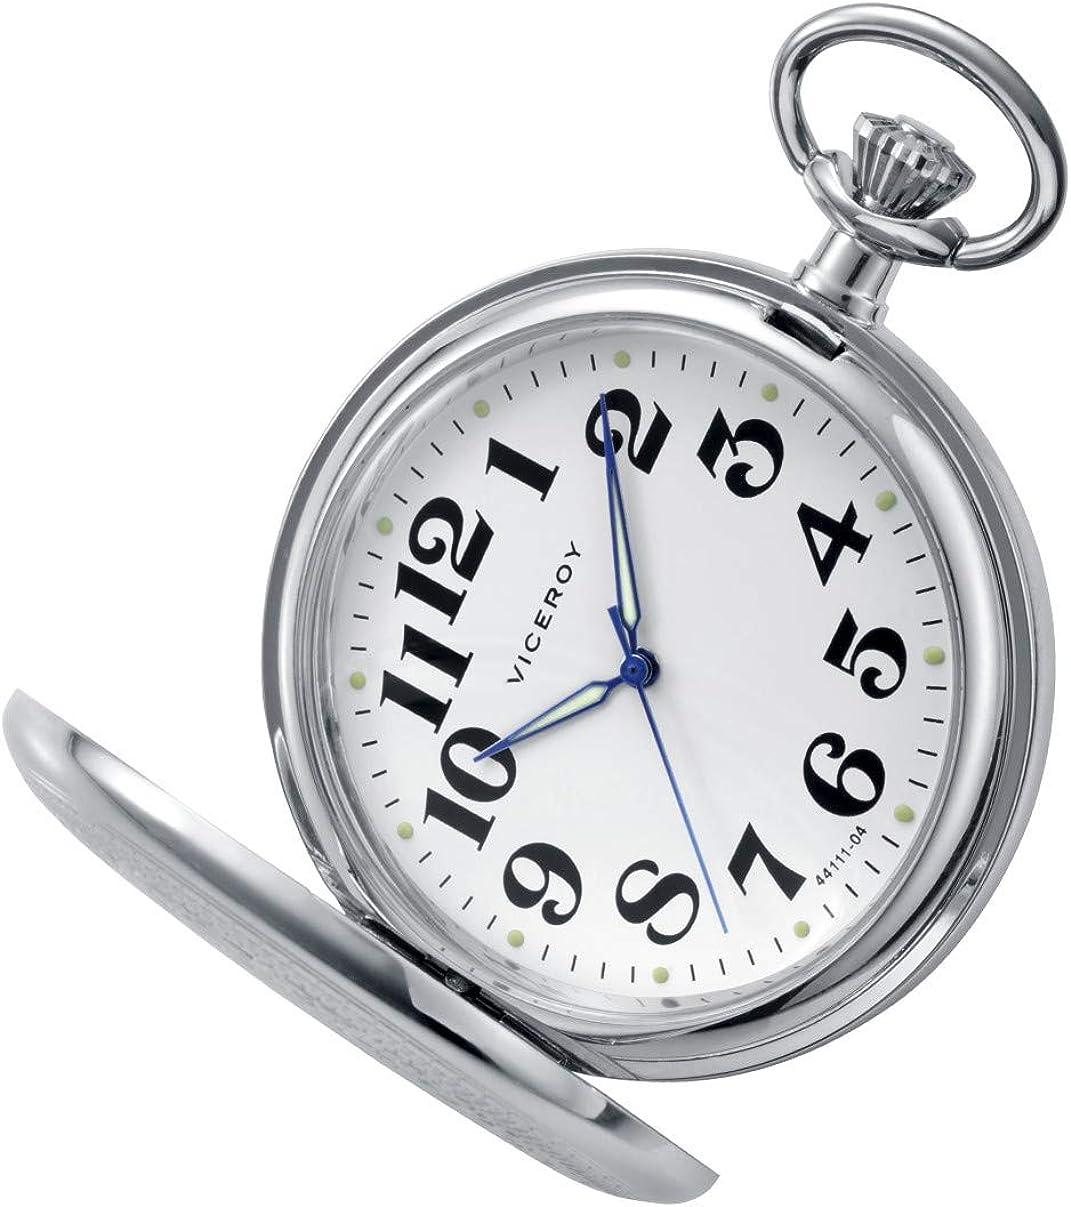 Reloj Viceroy Bolsillo 44111-04 con Cadena IP Plateado